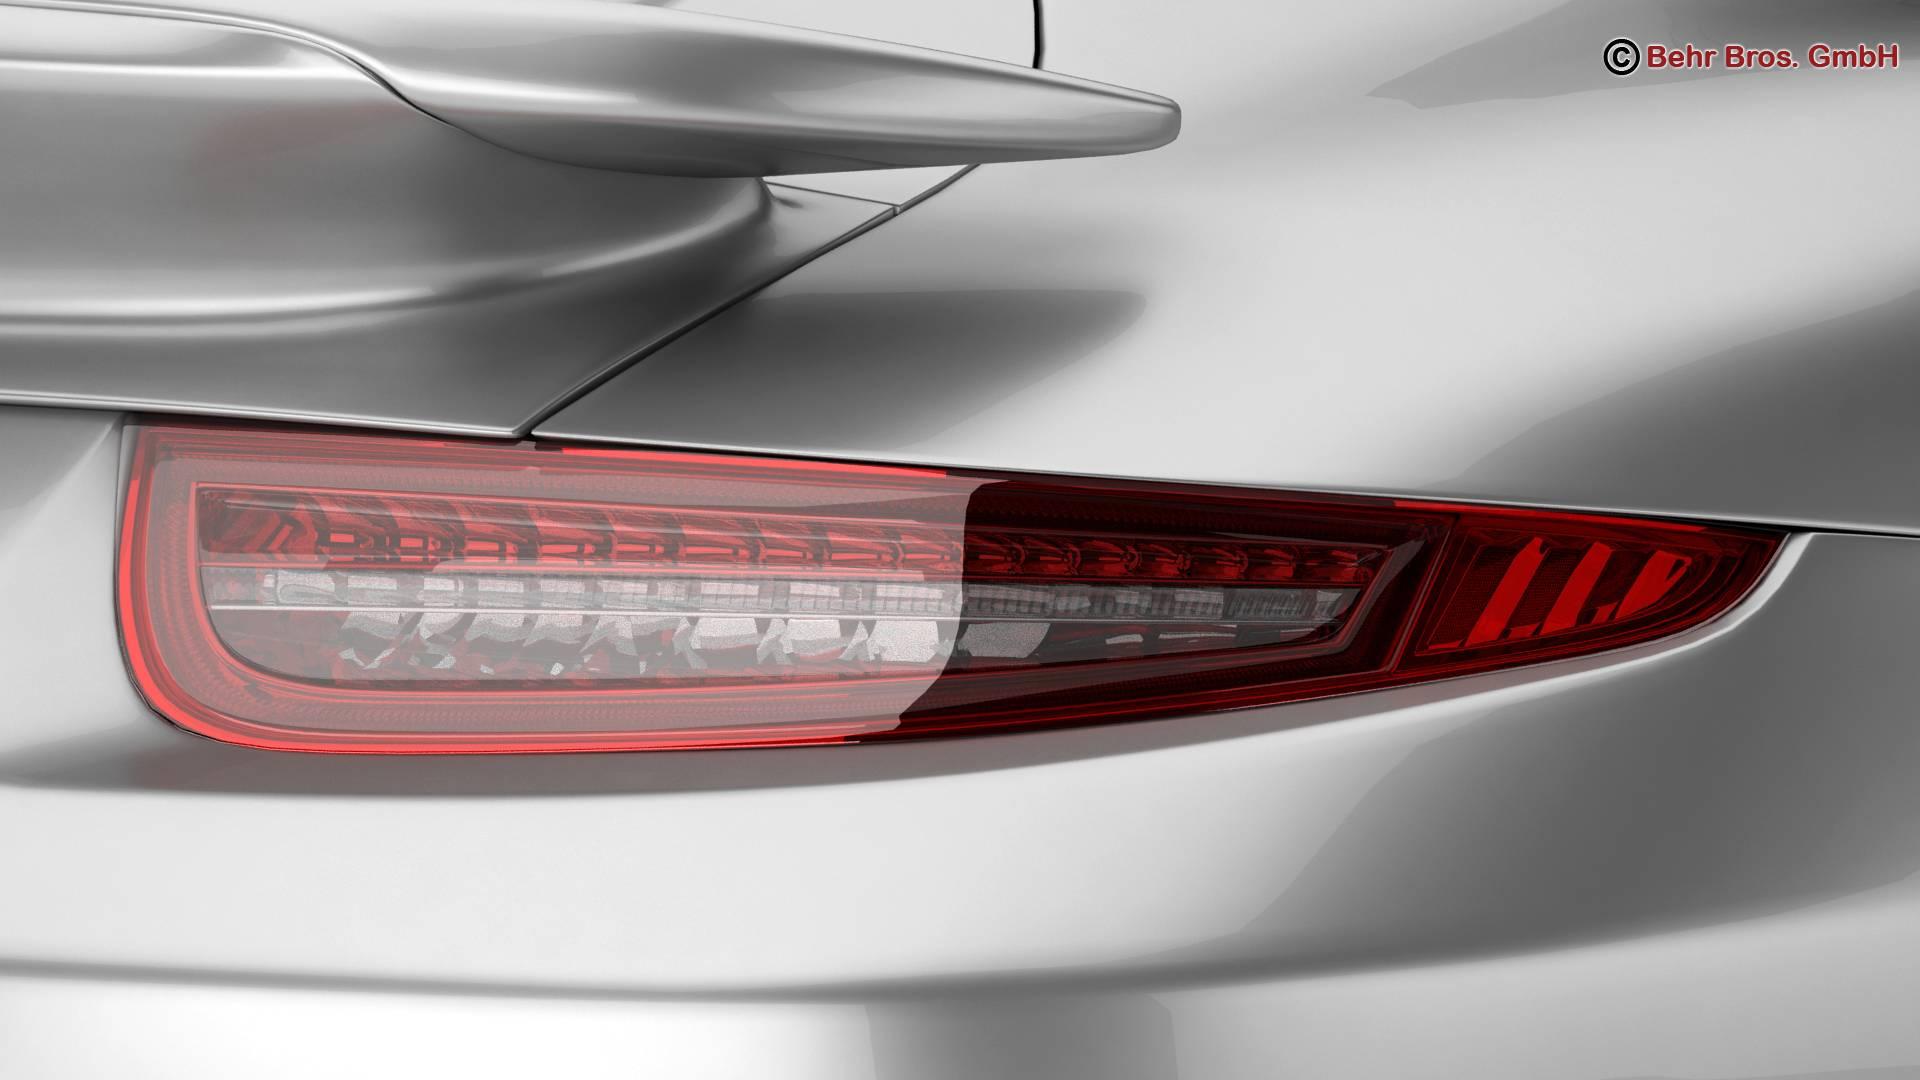 porsche 911 turbo s 2014 3d model 3ds max fbx c4d lwo ma mb obj 212486